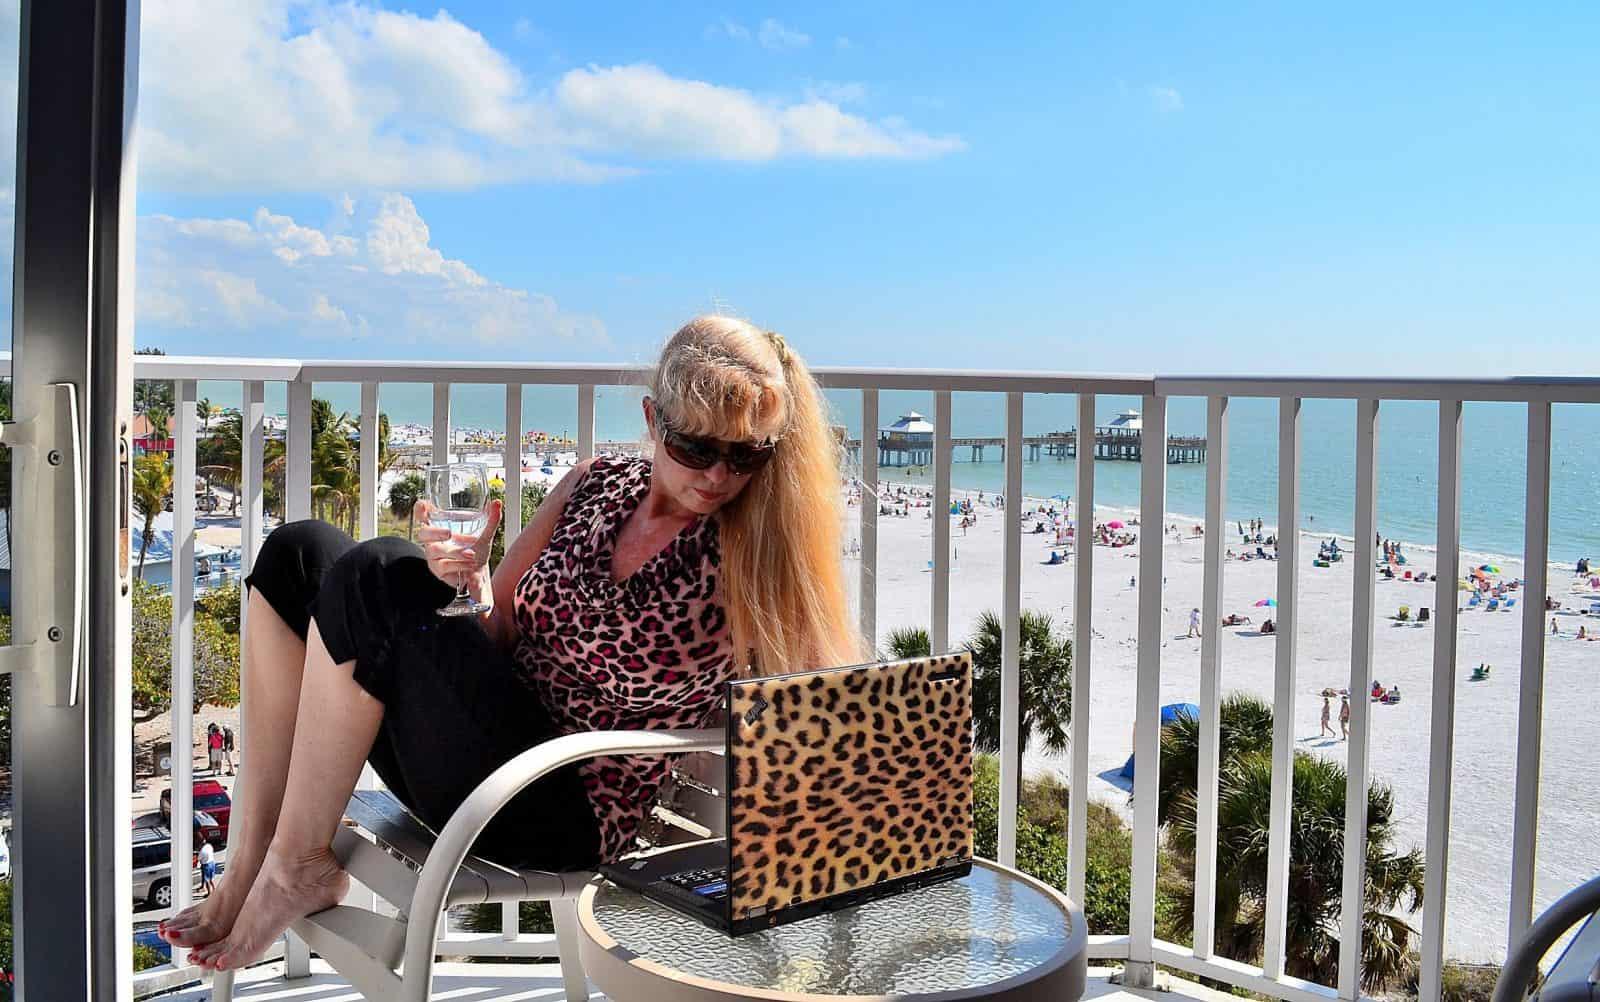 Patti Morrow, Luggage and Lipstick